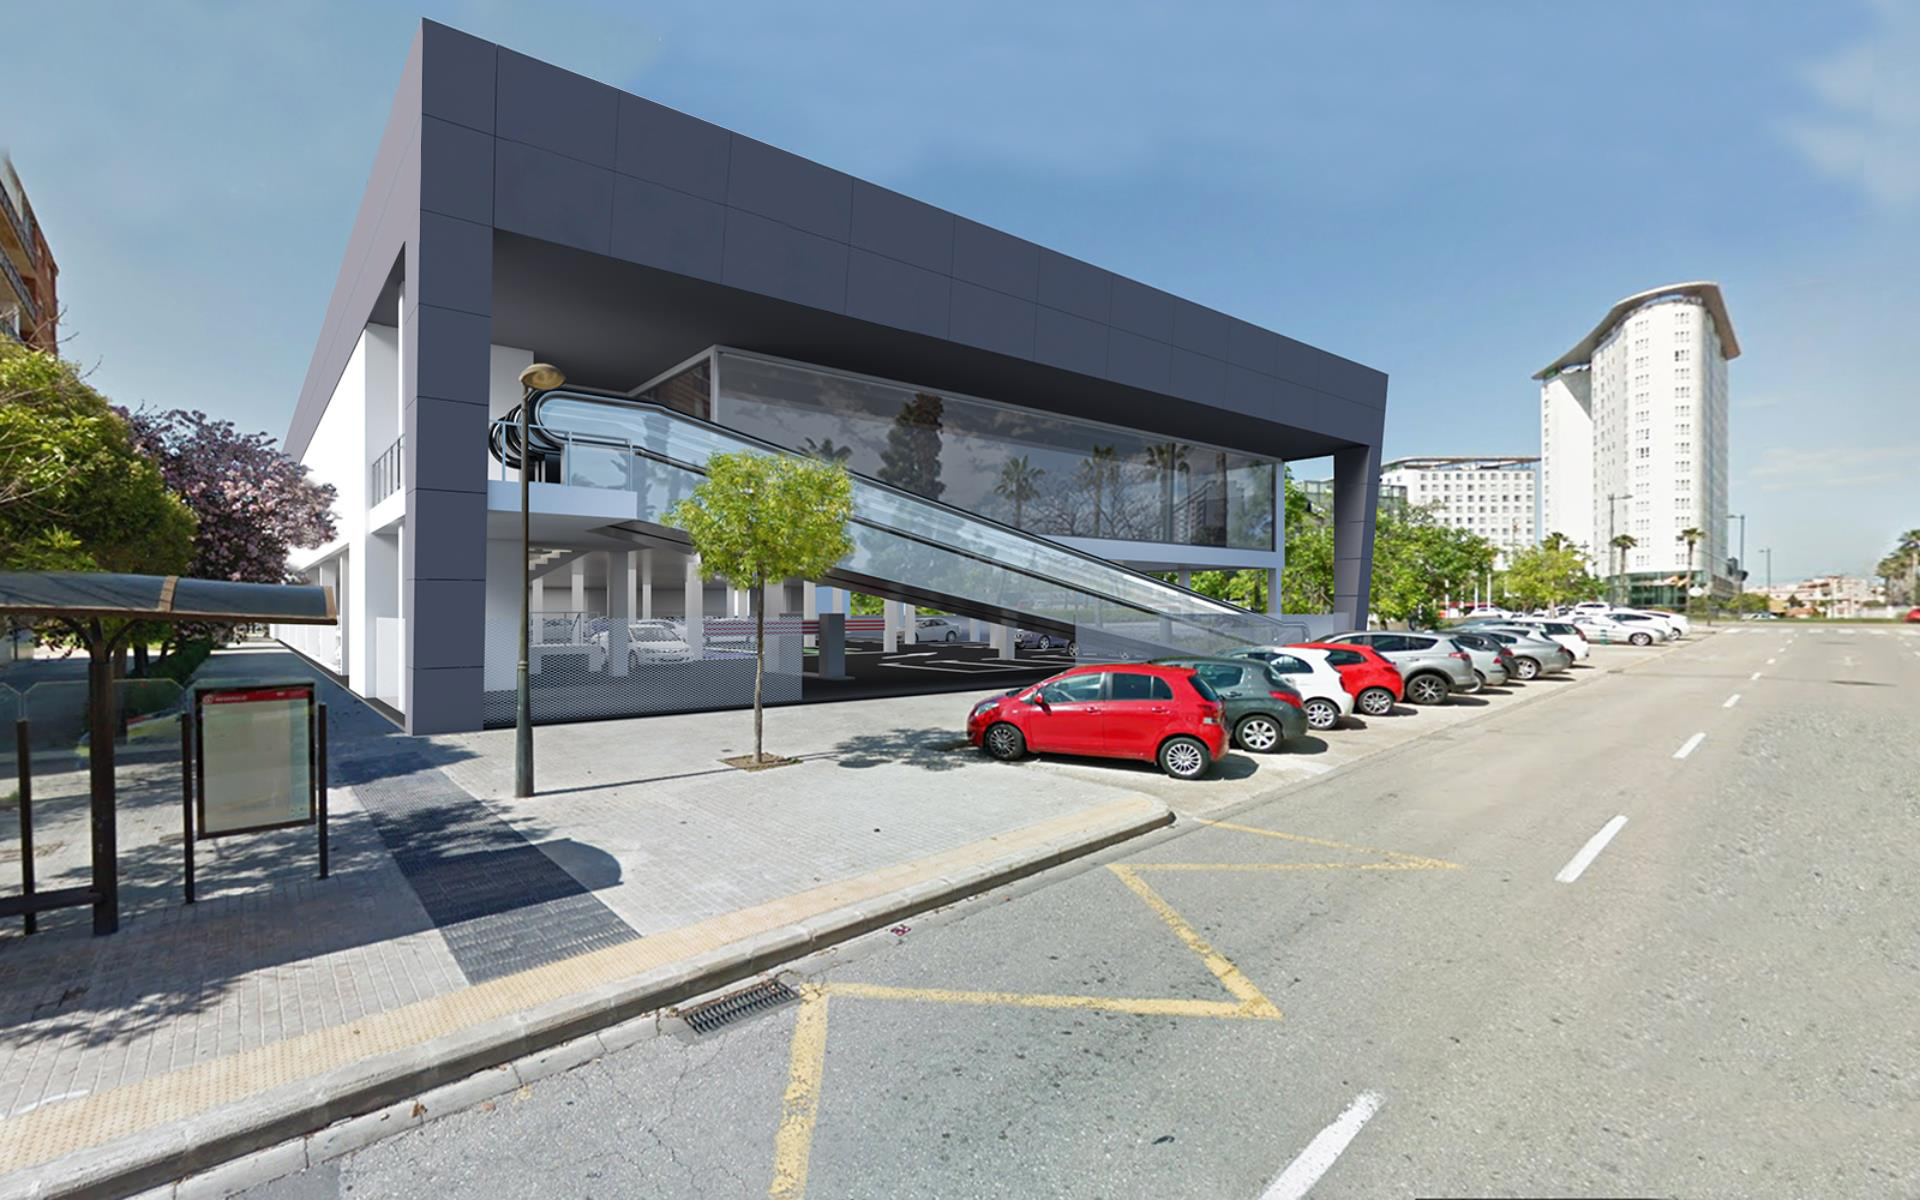 render-3d-visualizacion-arquitectonica-retail